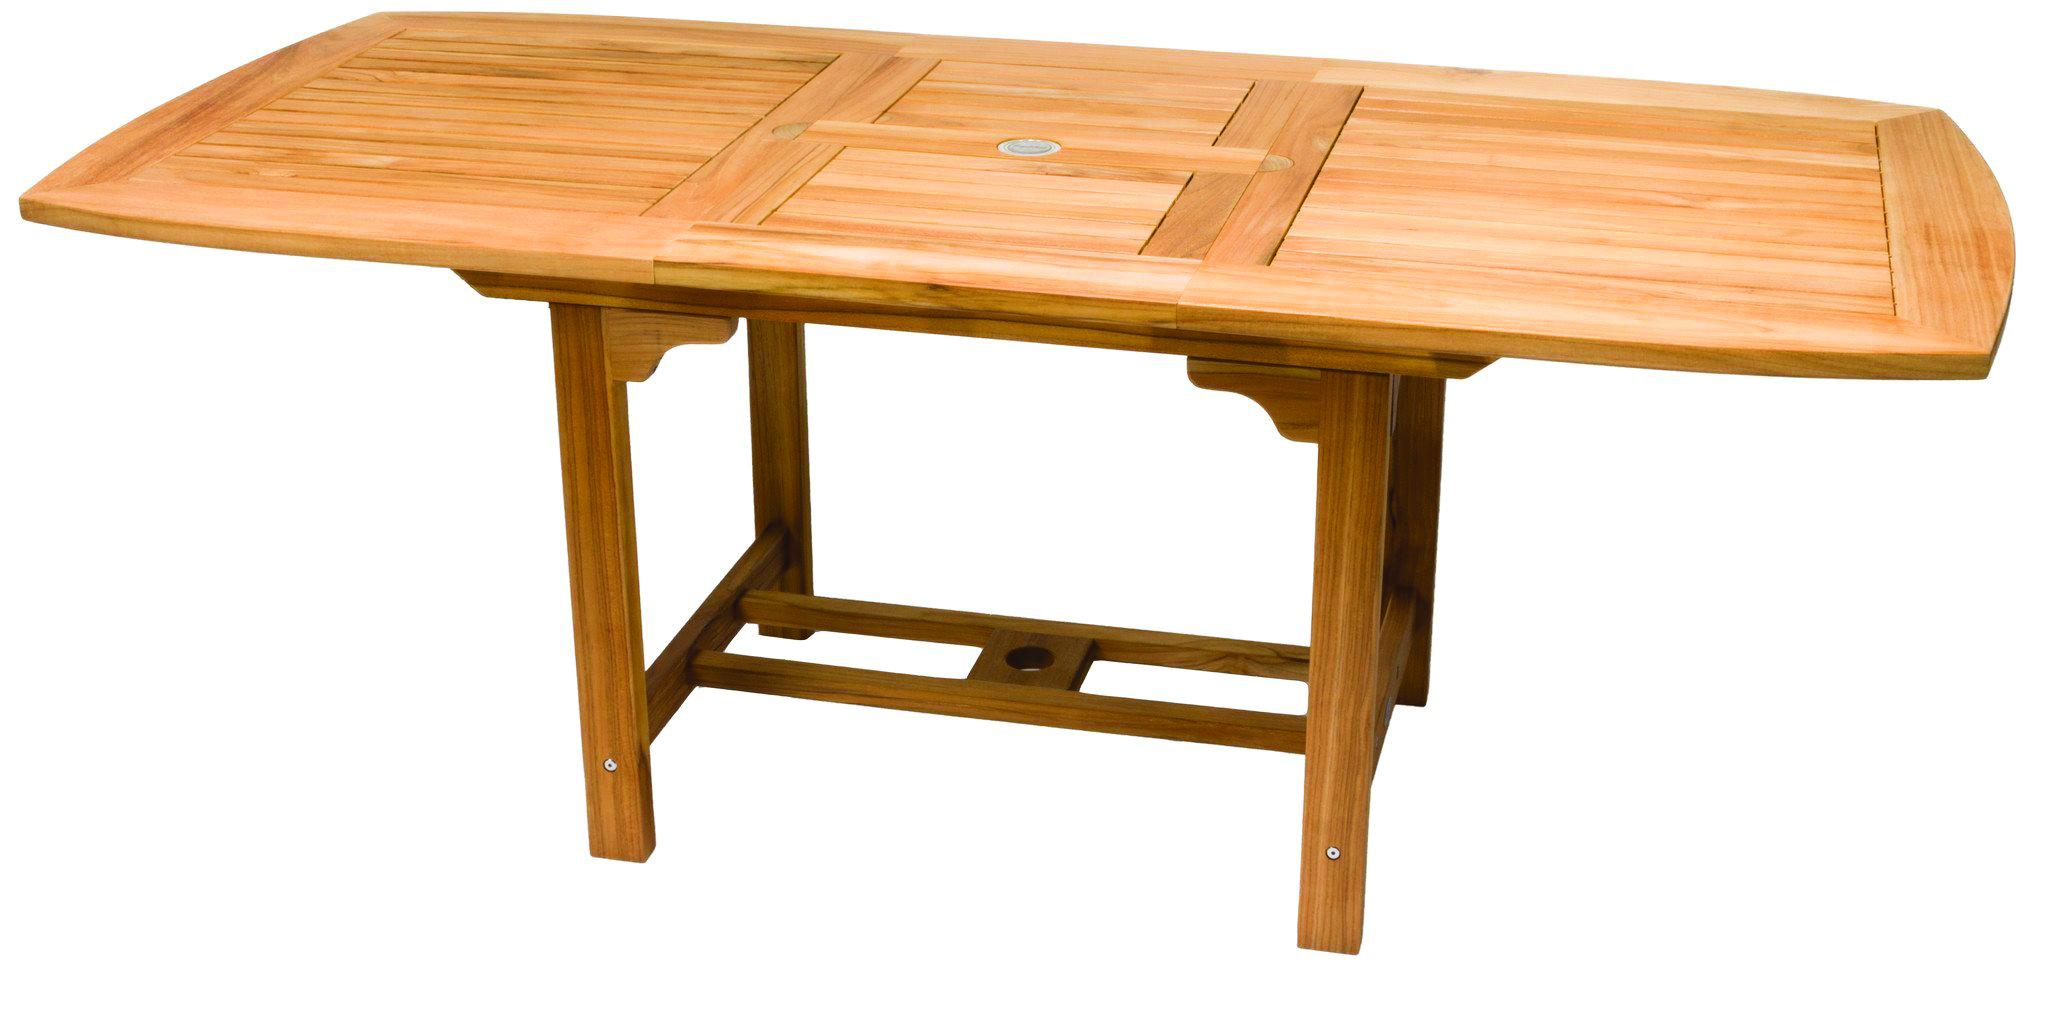 Foot Rectangular Teak Extension Table By Royal Teak Collection - Teak extension table outdoor